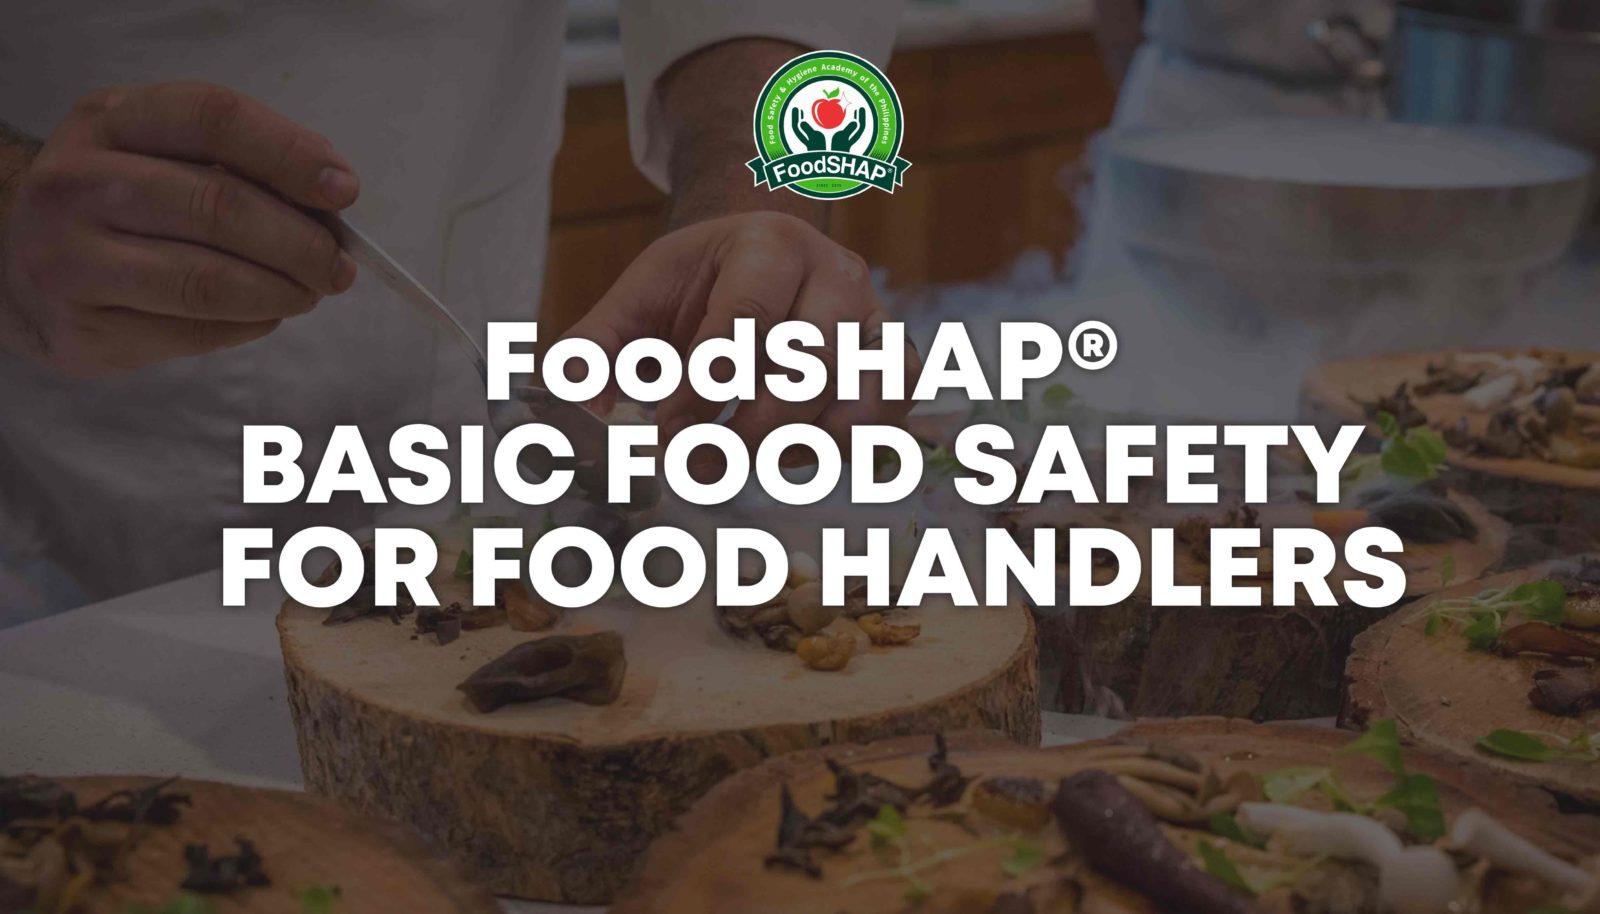 FoodSHAP® BASIC FOOD SAFETY (BFS) for Food Handlers